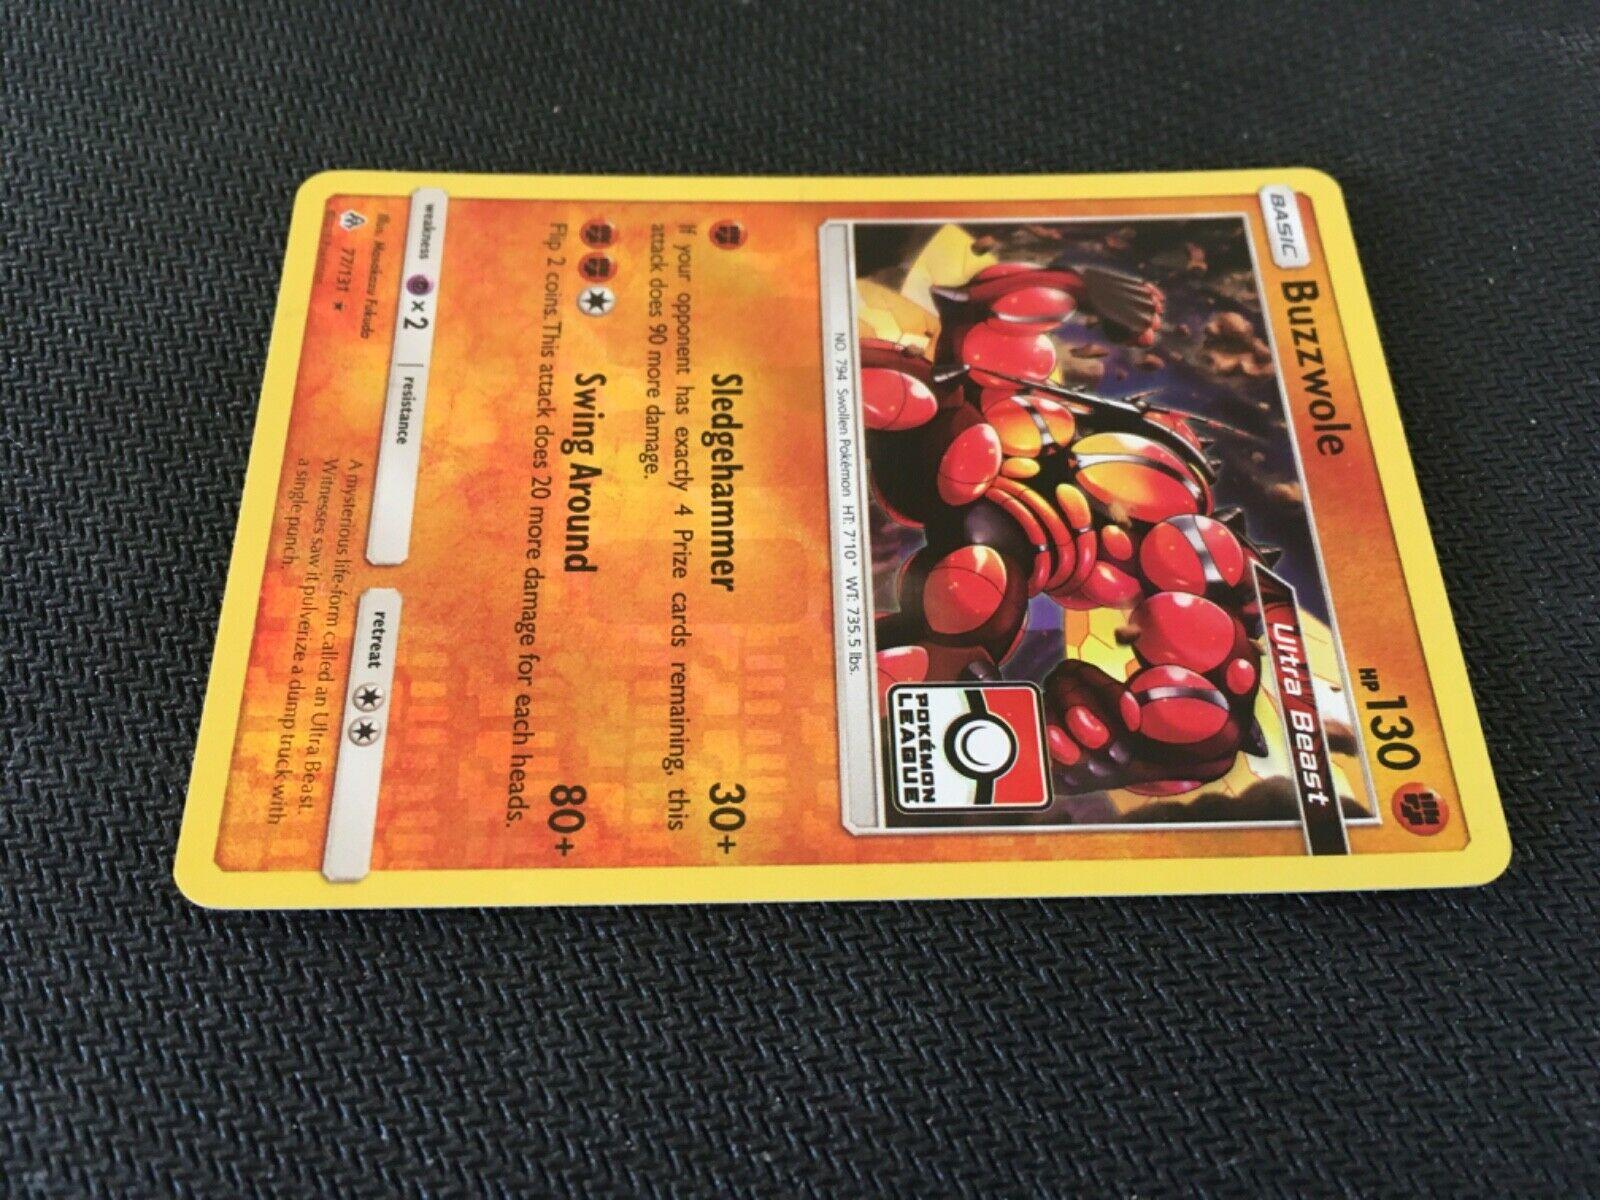 Buzzwole Rare Holo League Promo Pokemon Card Trainer Item Forbidden Light 77/131 - Image 4